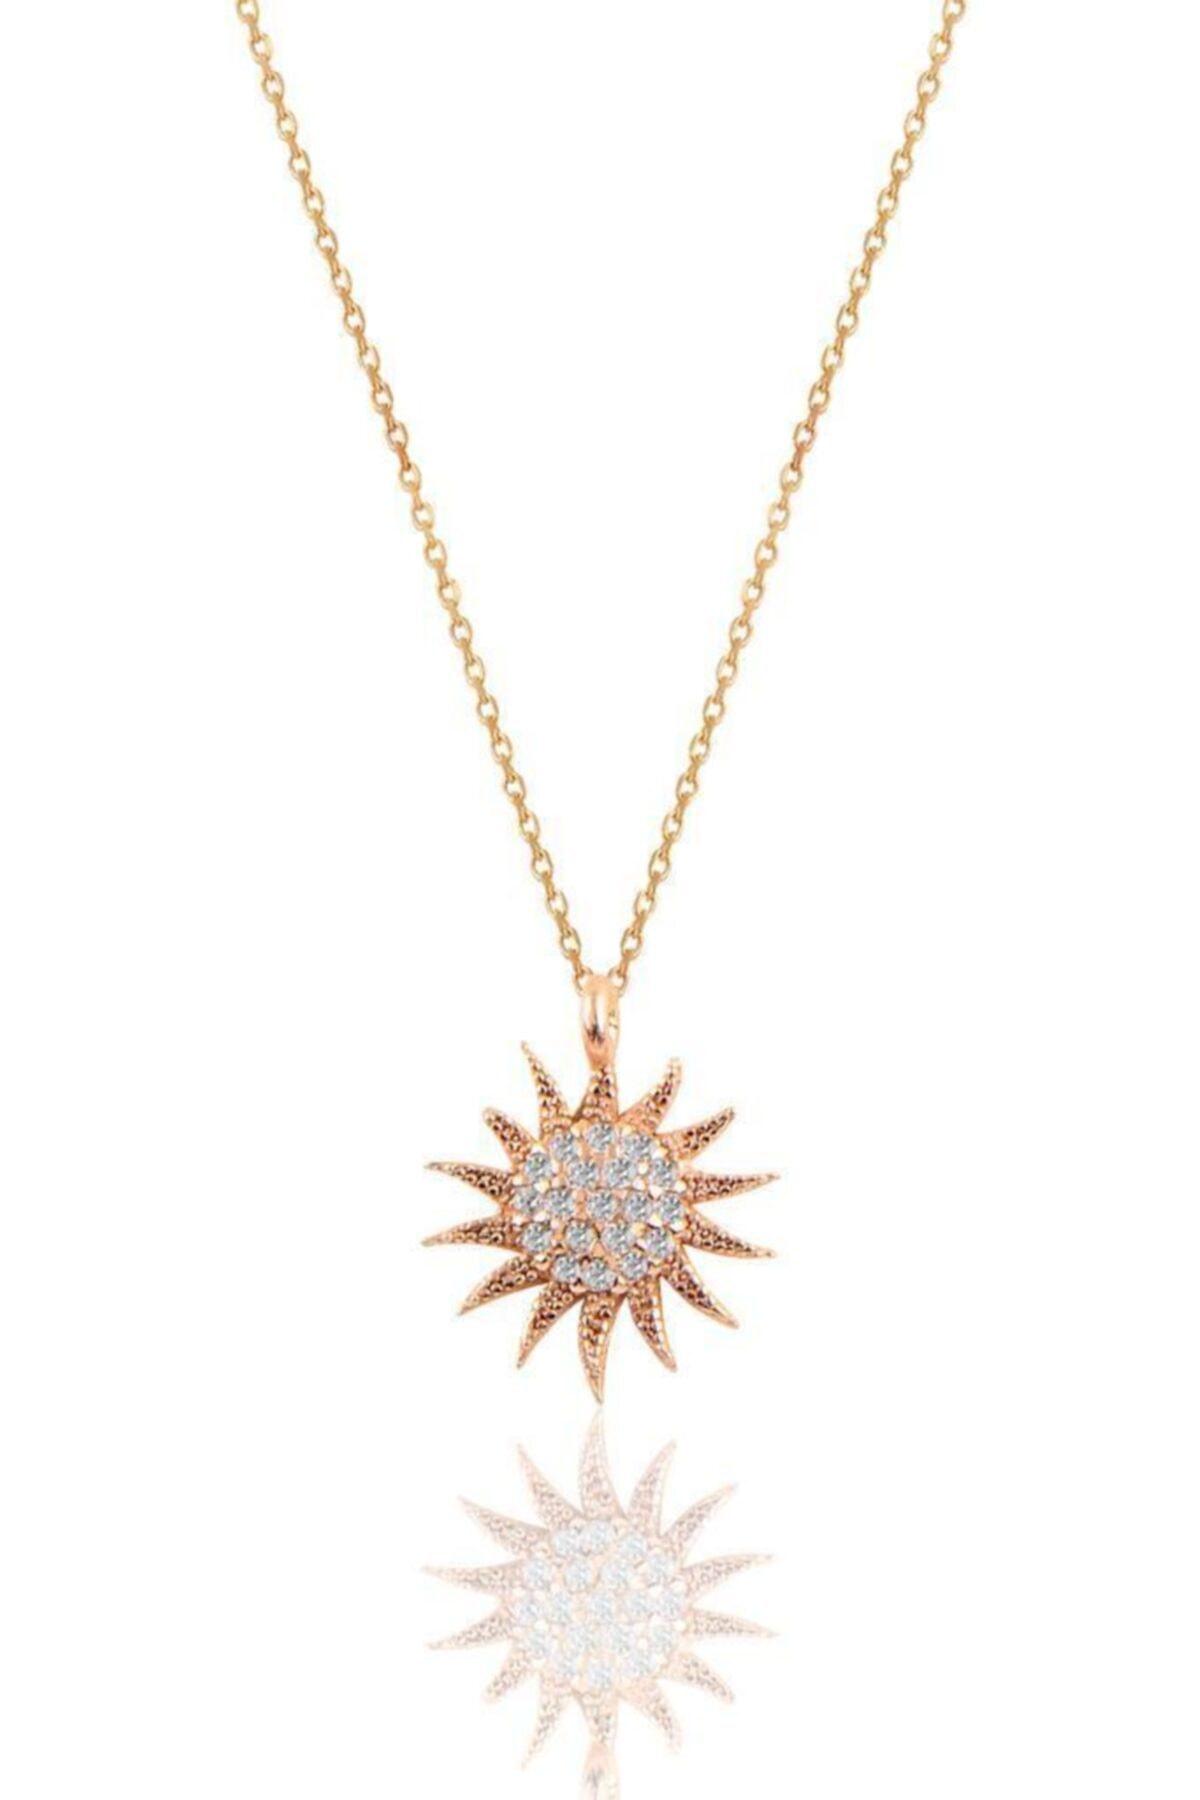 Söğütlü Silver Gümüş Rose Güneş Kolye 1